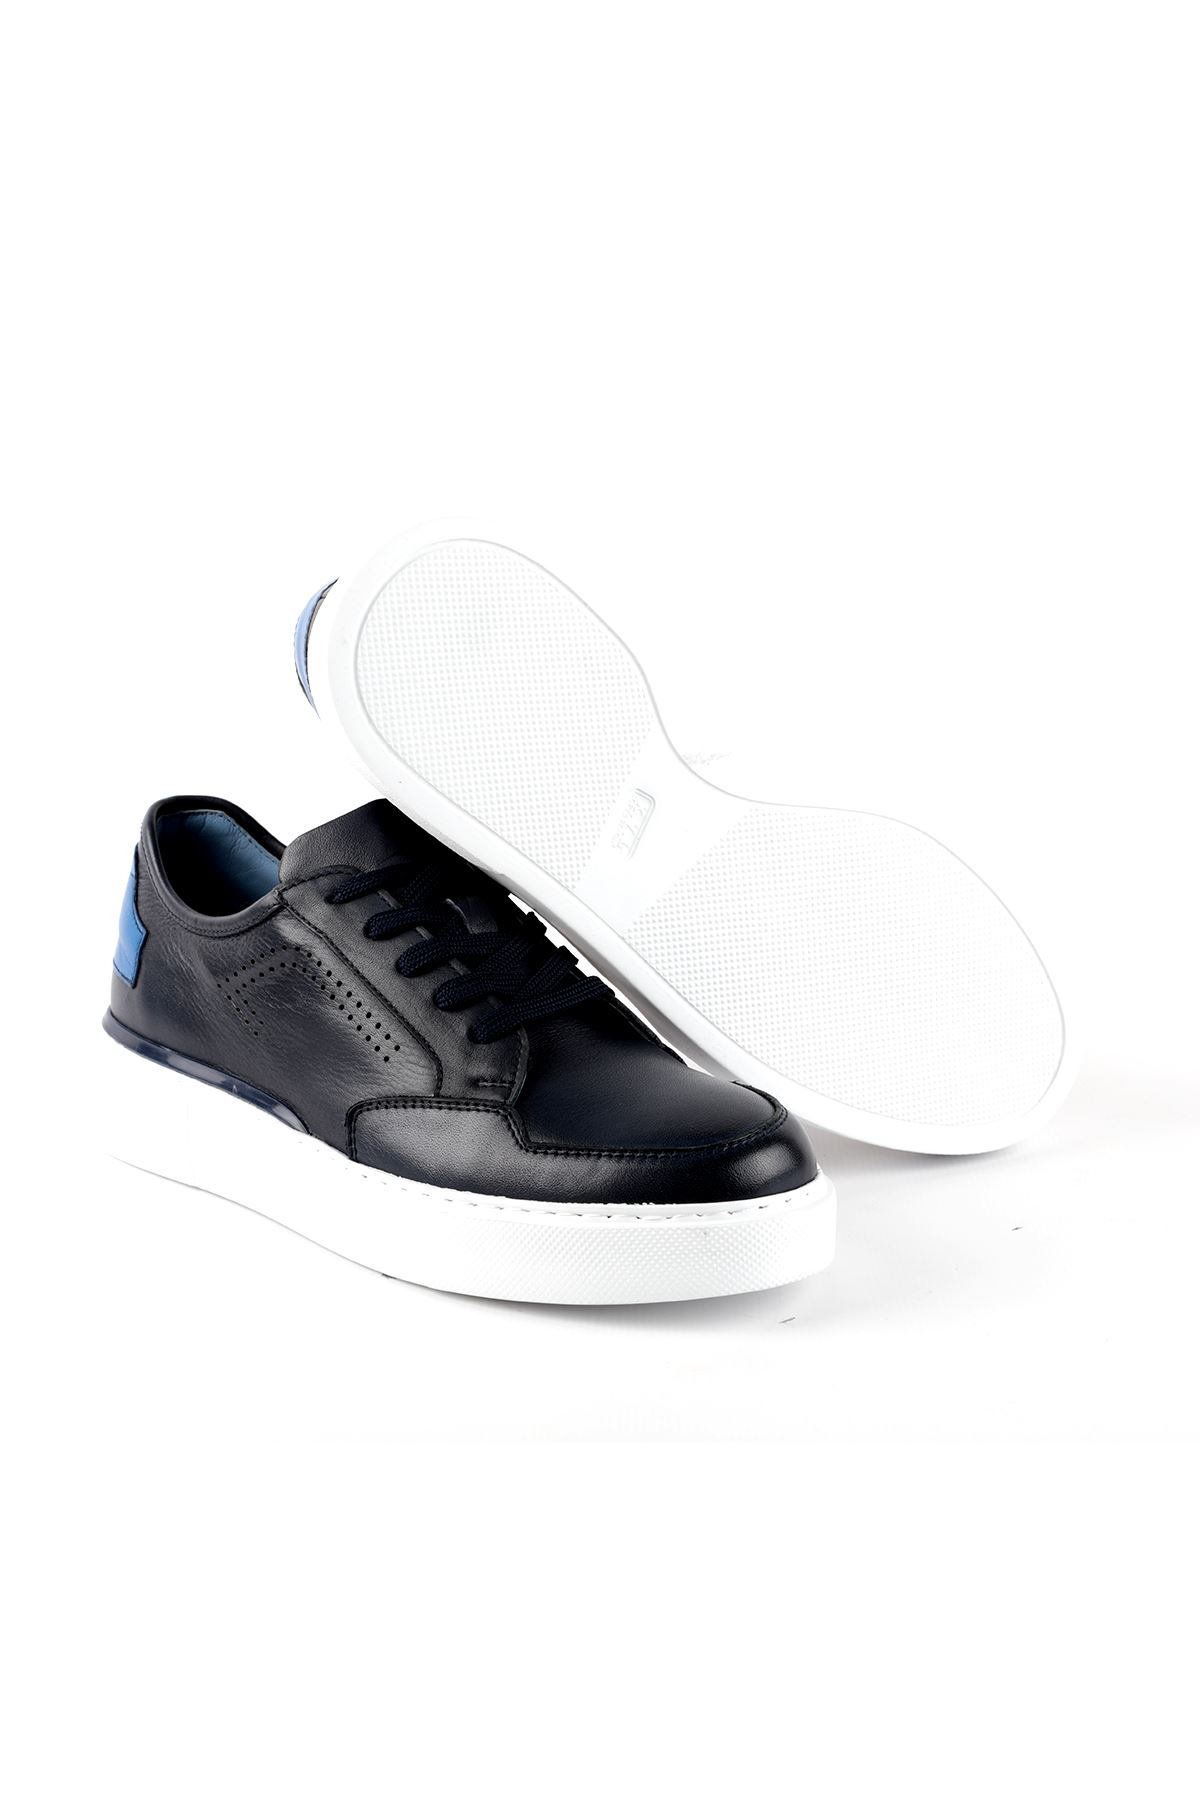 Libero L3784 Lacivert Spor Ayakkabı